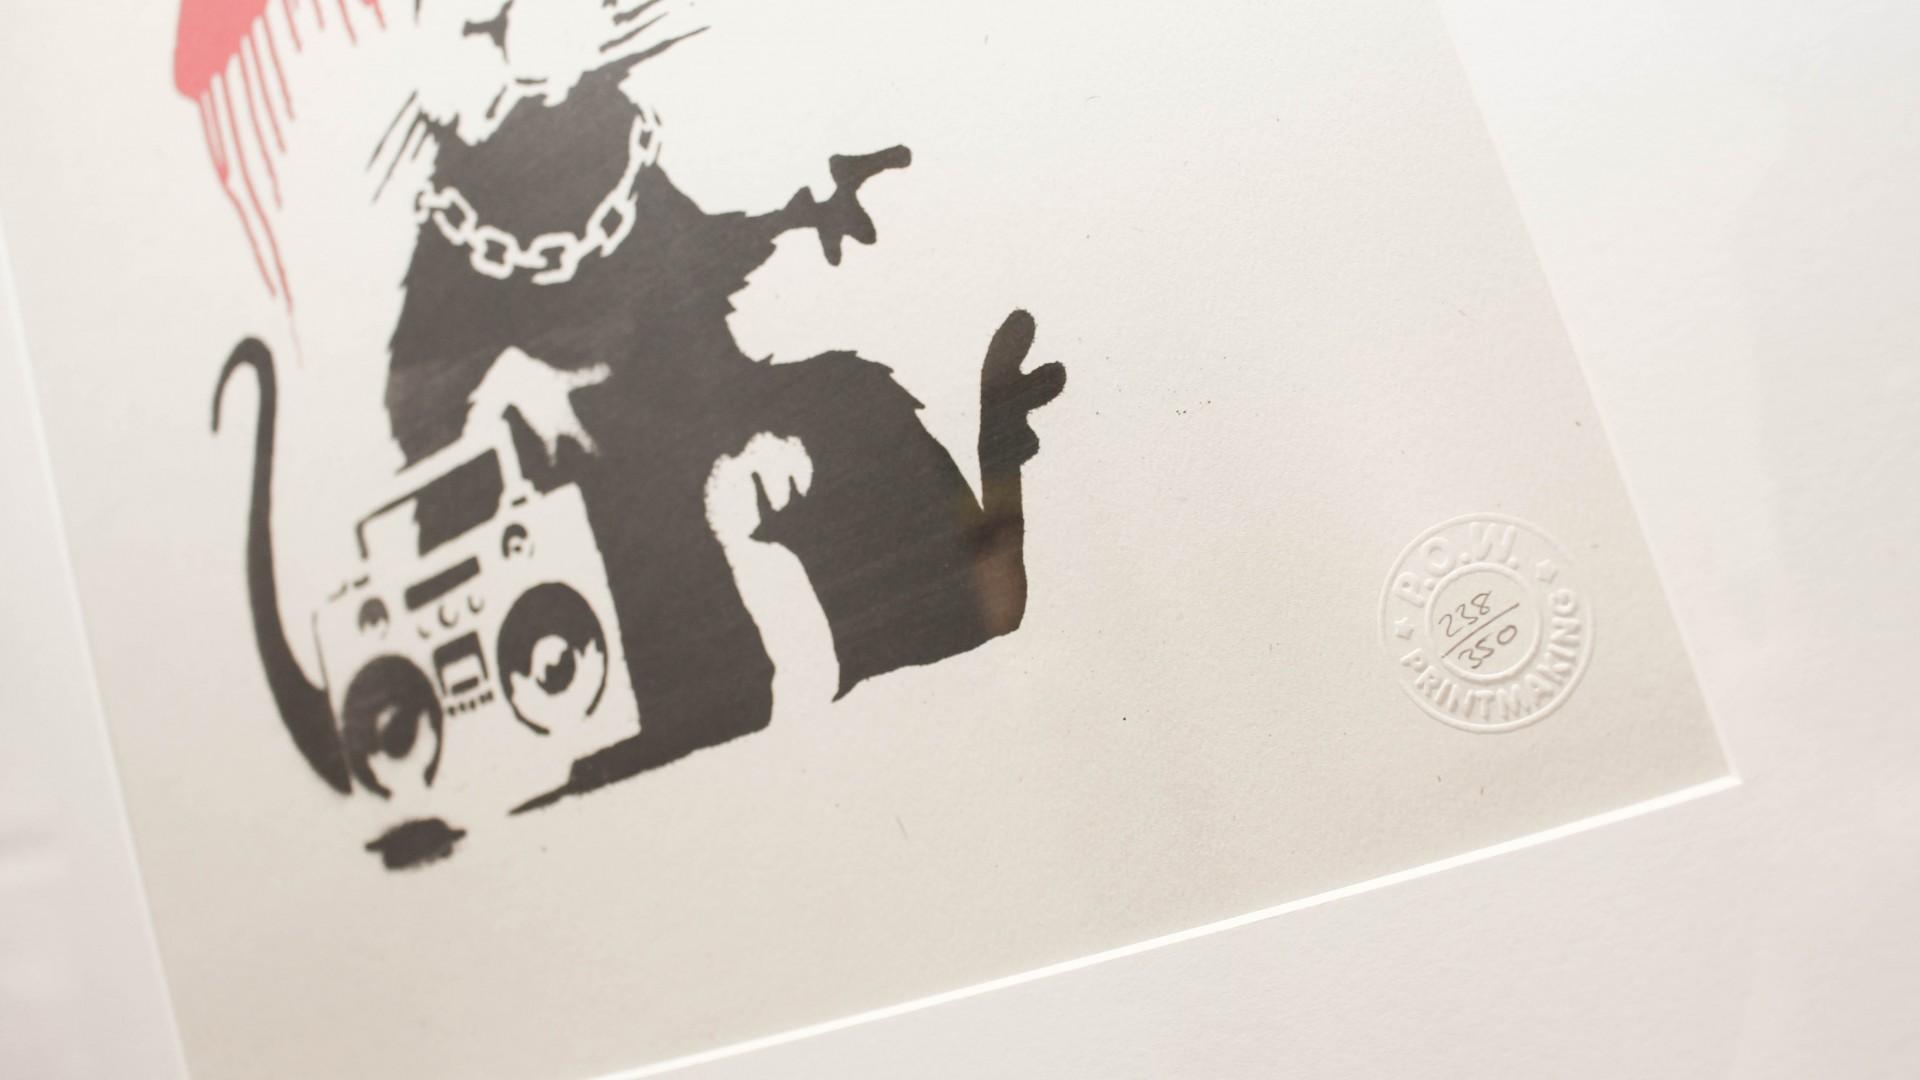 Seven tips for investing in Banksy artwork